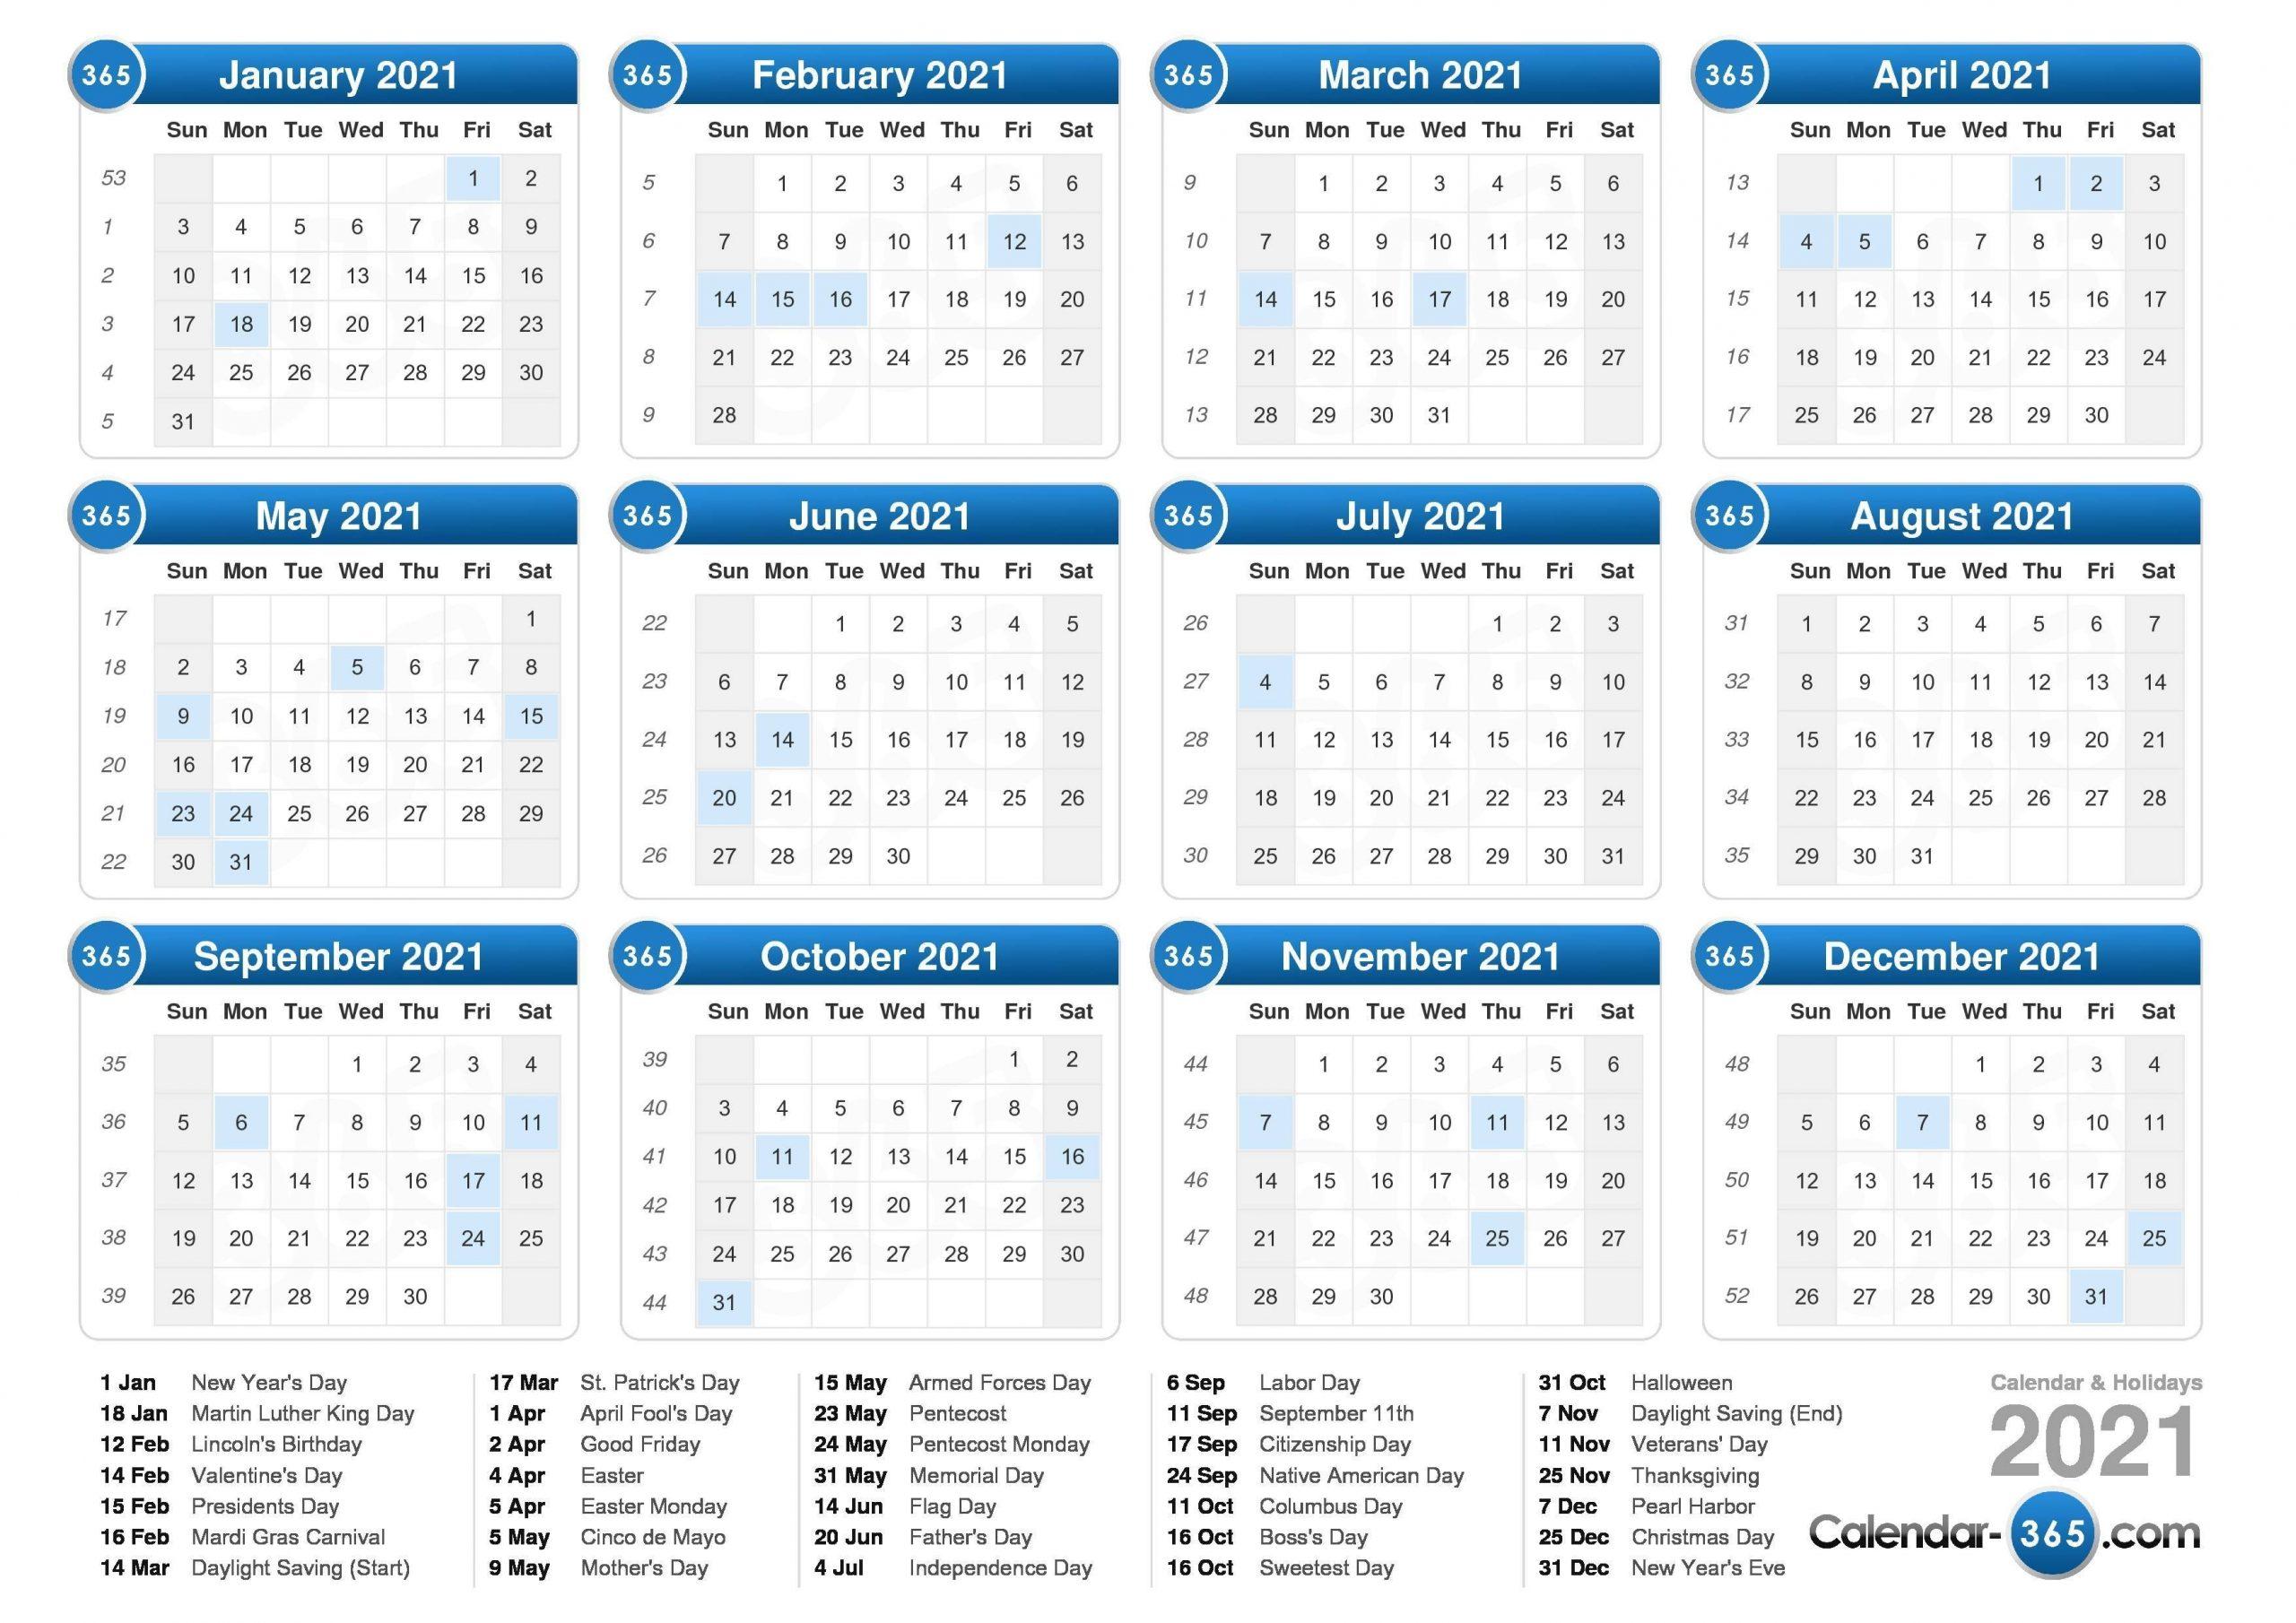 2021 Calendar-2021 Vacation Schedule